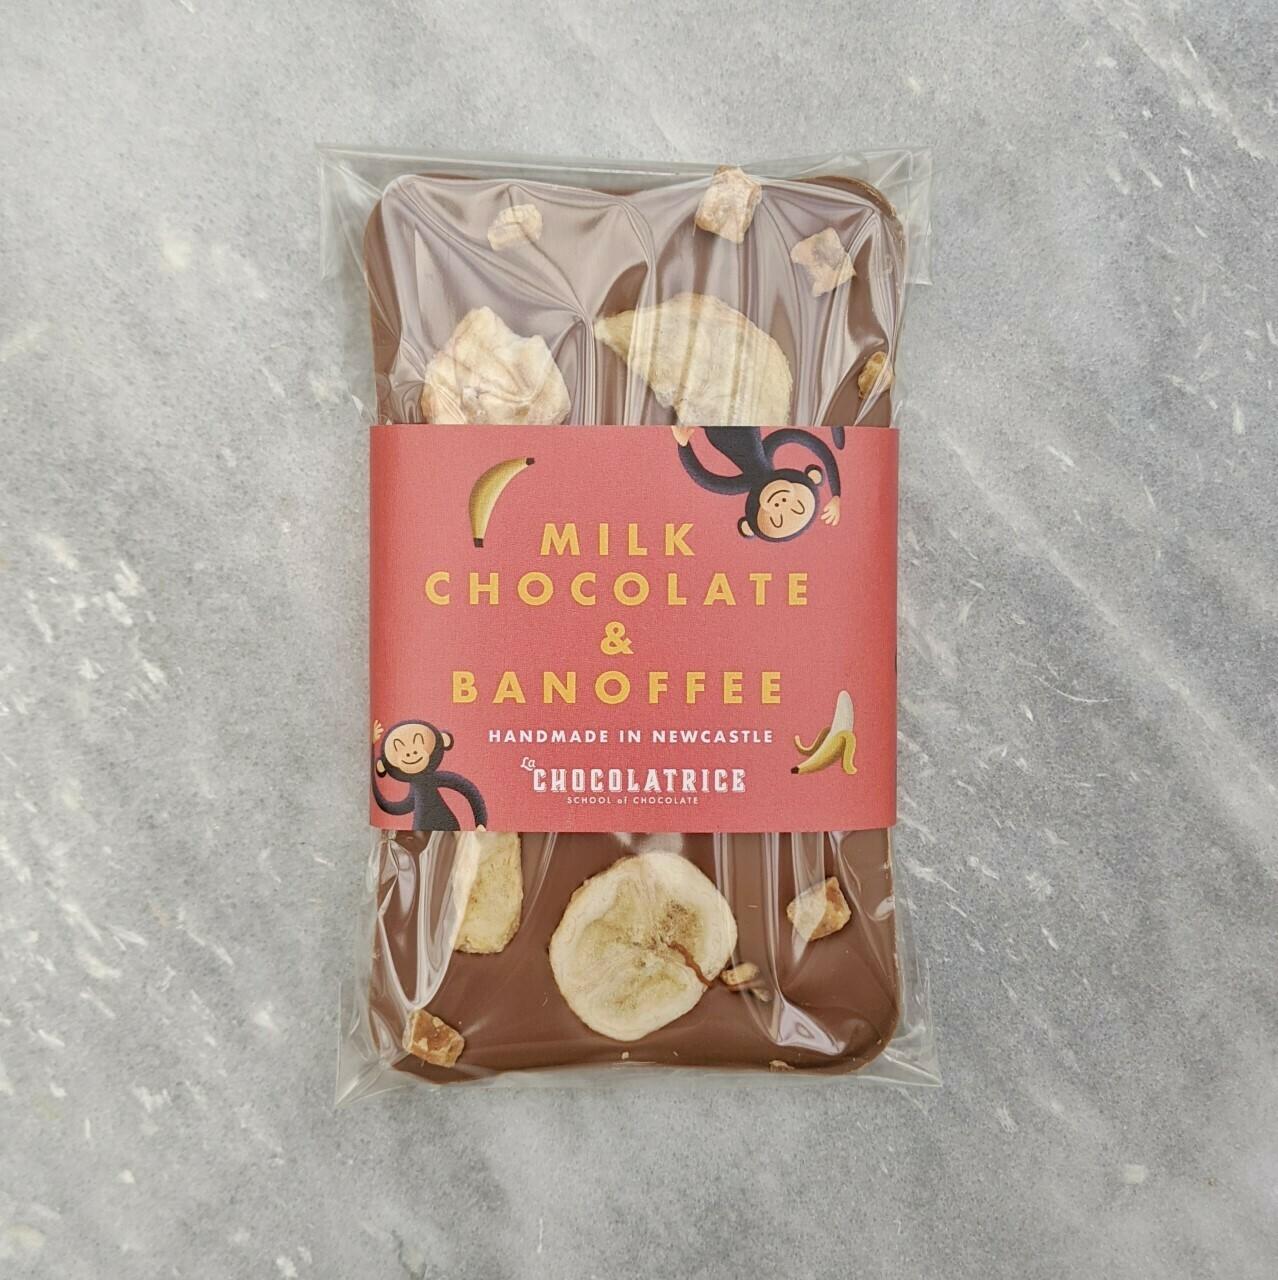 Milk Chocolate Banoffee Bar